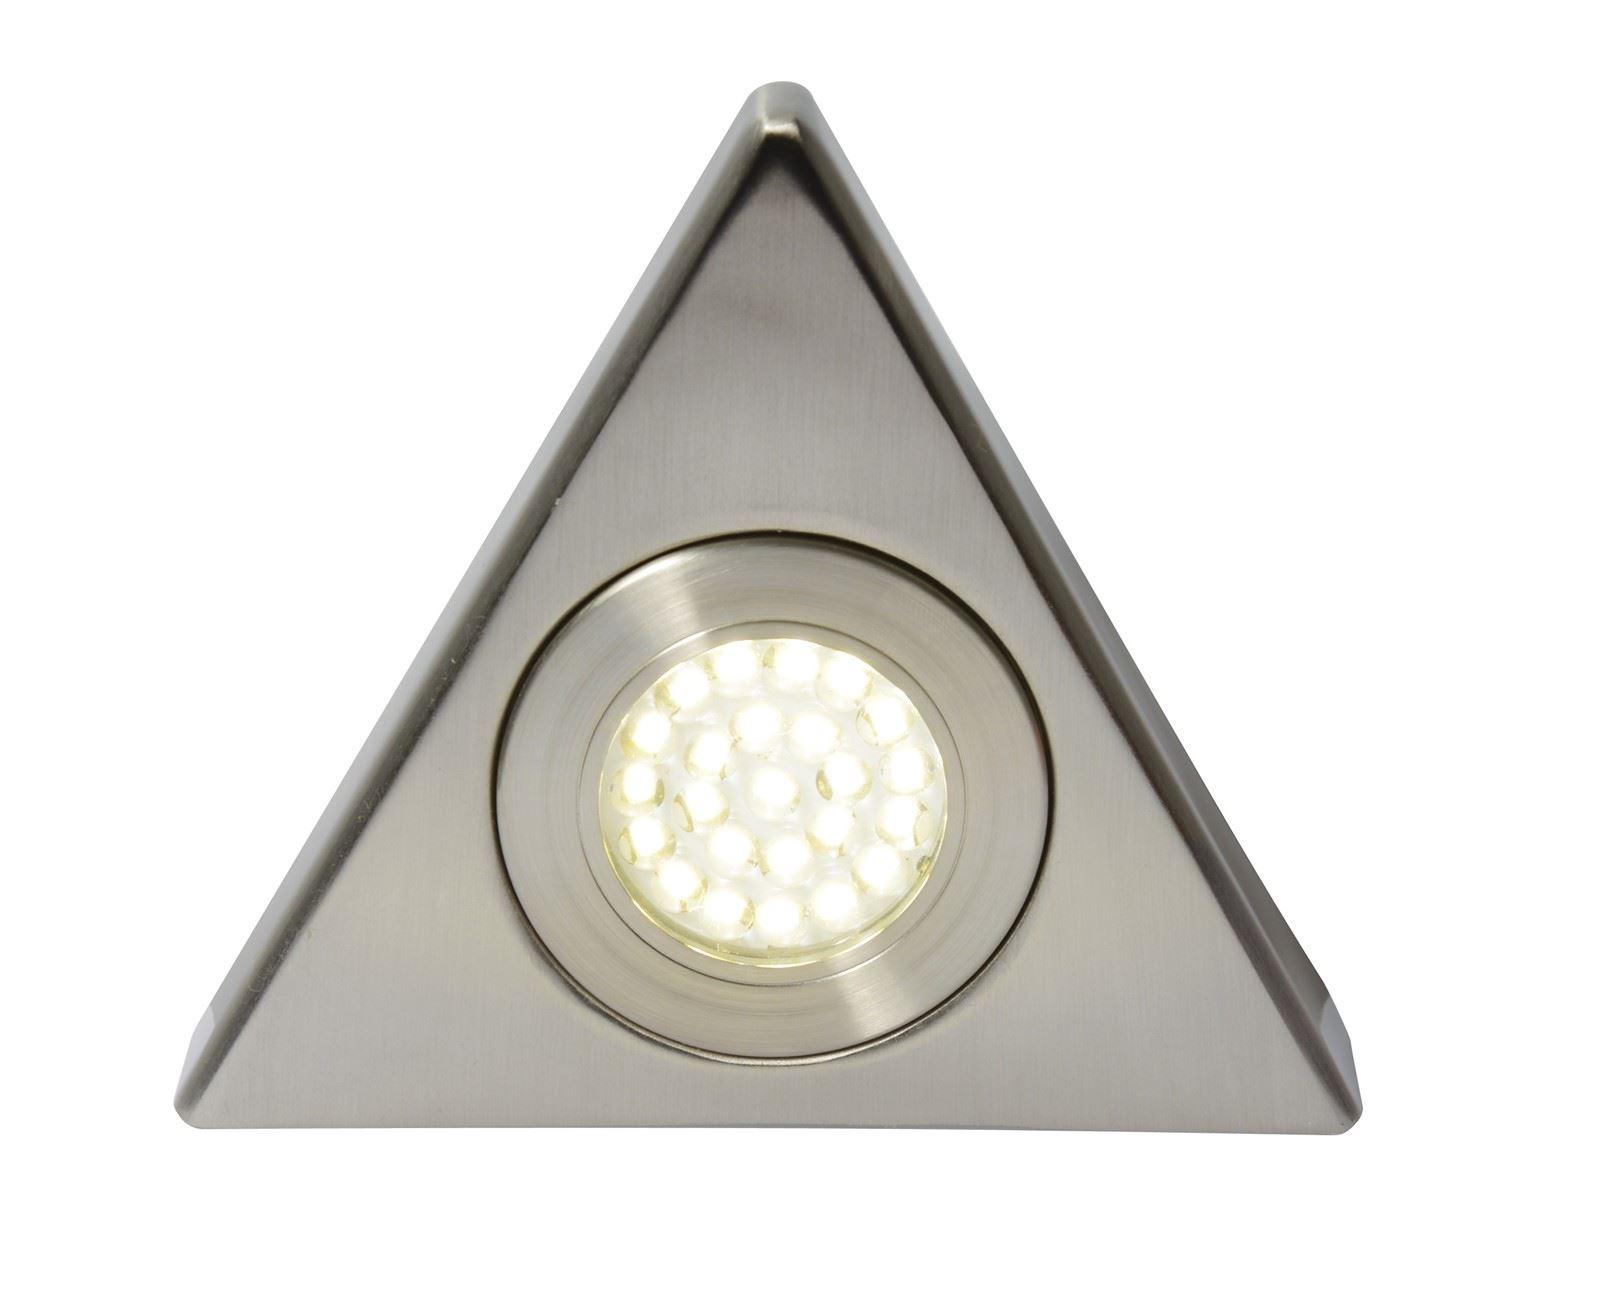 Fonte Led, Mains Voltage, Triangular Cabinet Light, 6000K Day Light